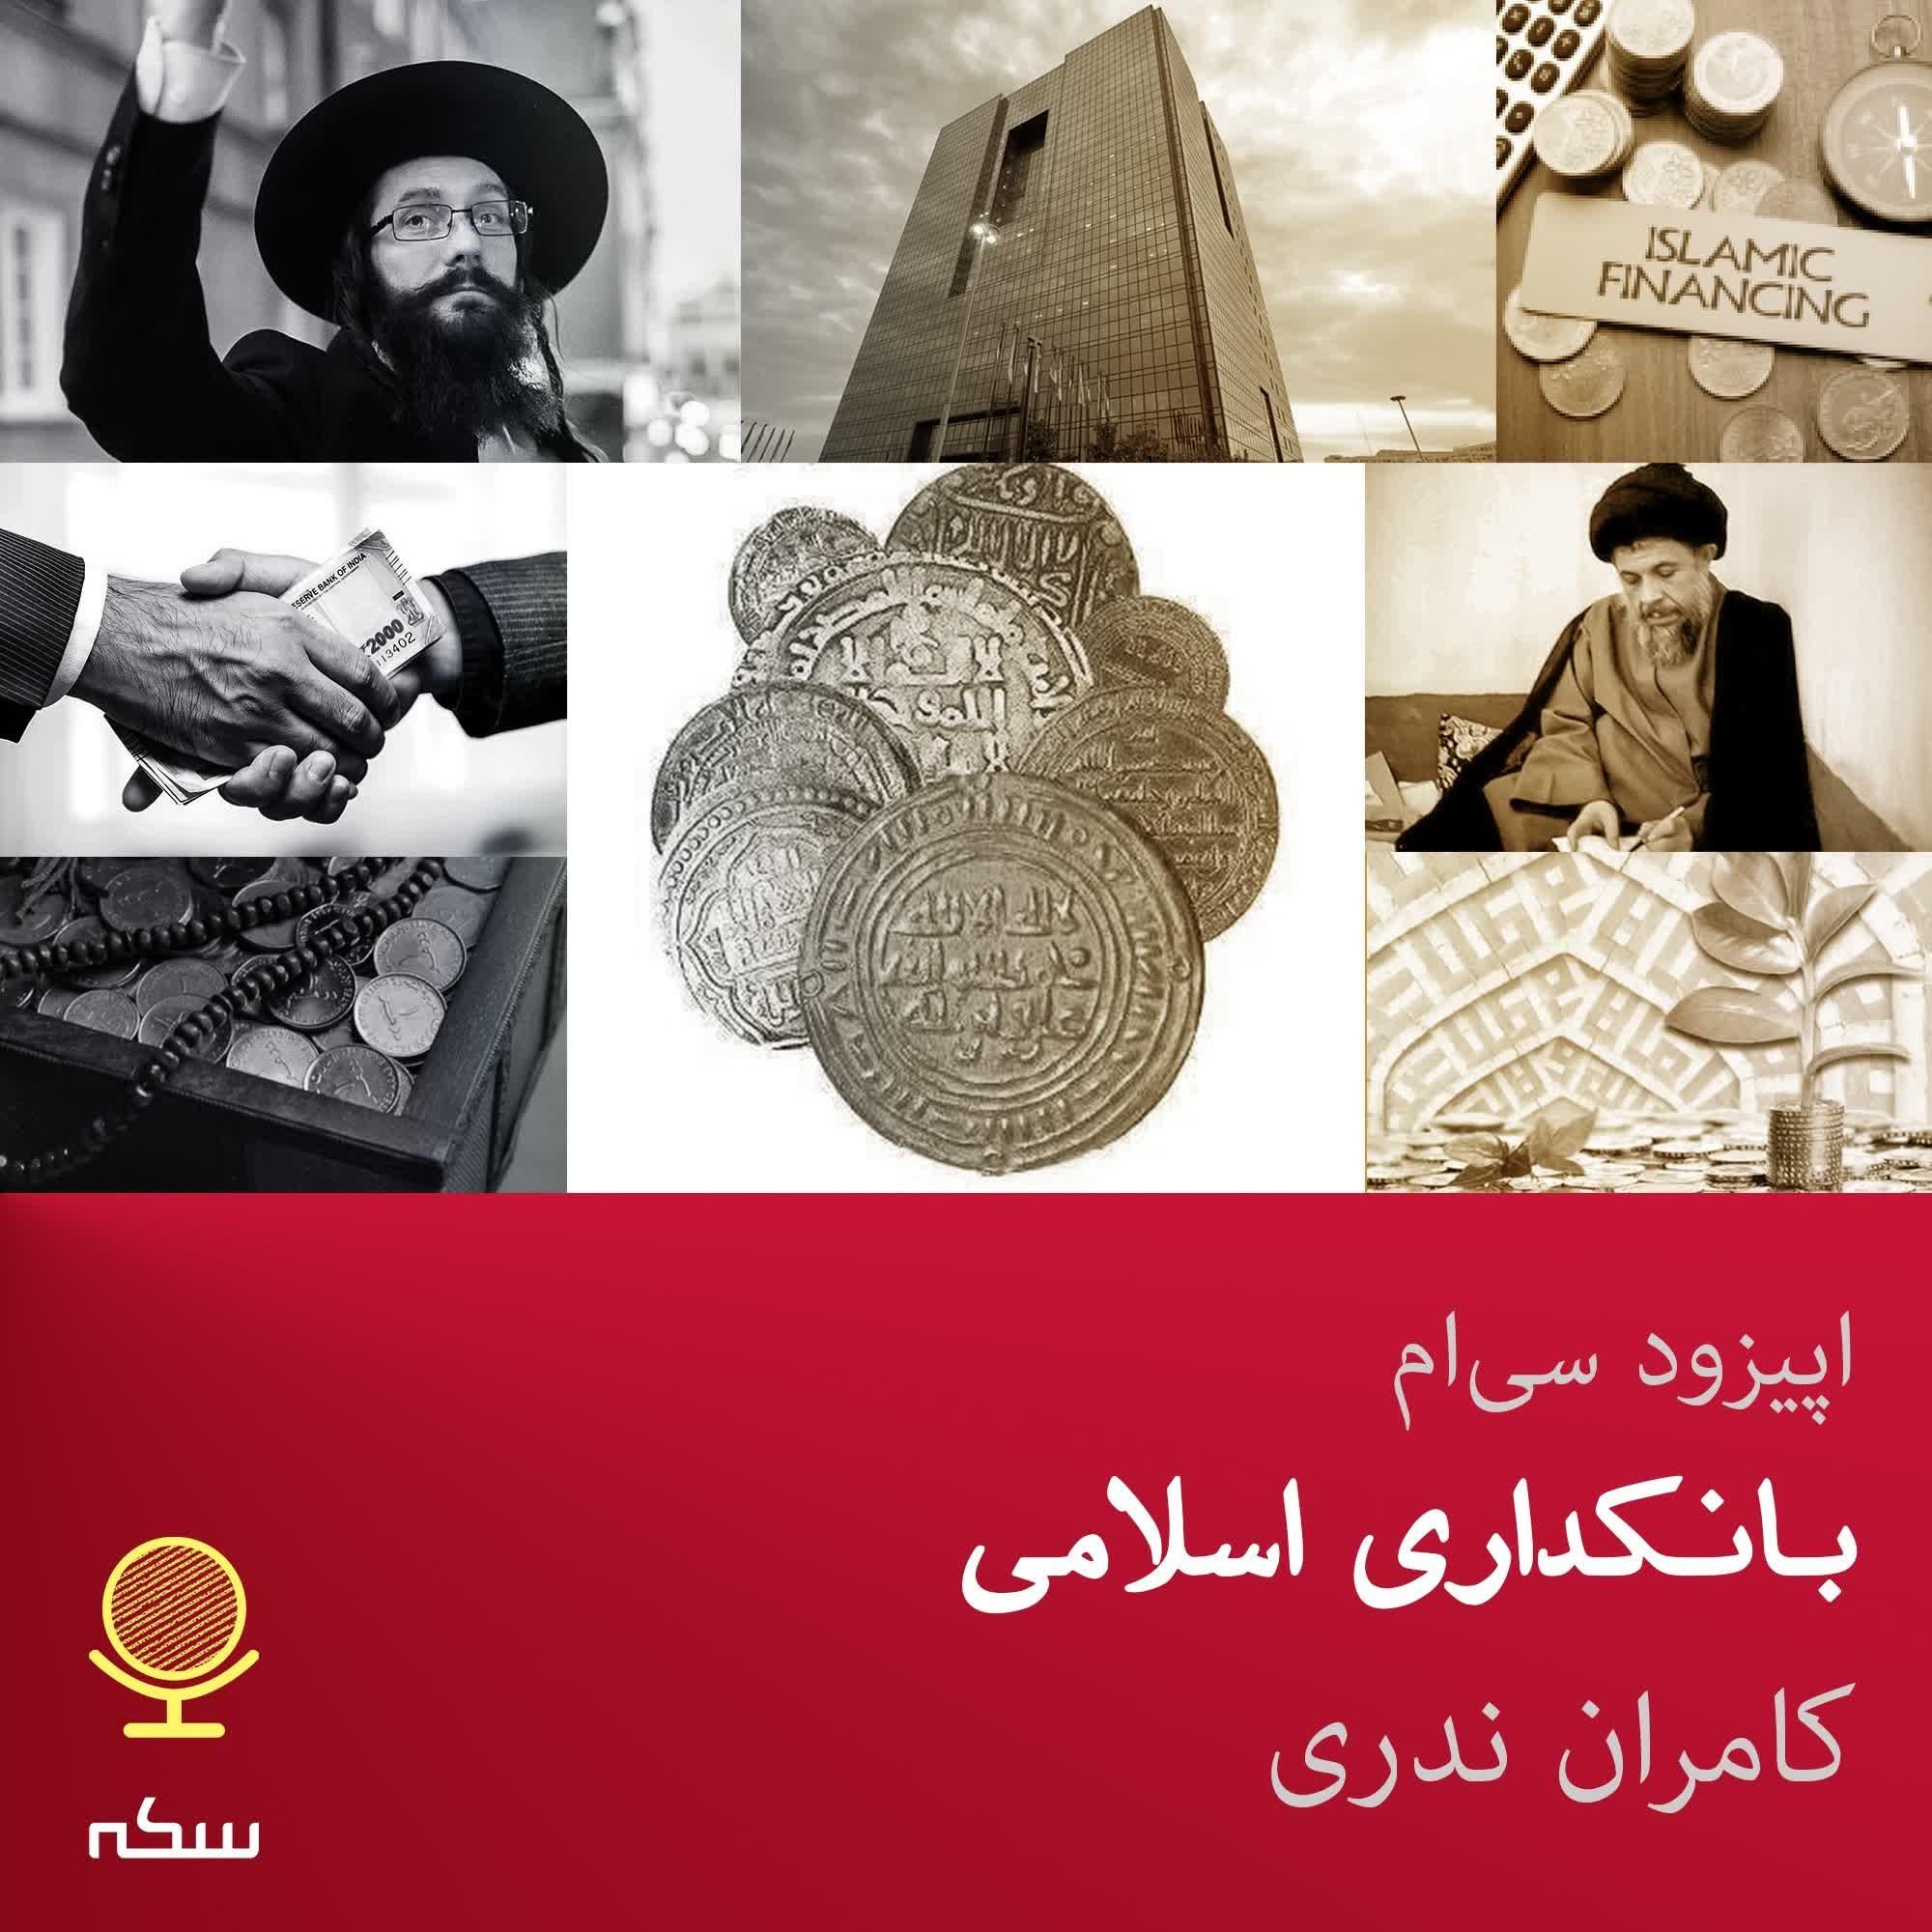 پادکست سکه   بانکداری اسلامی